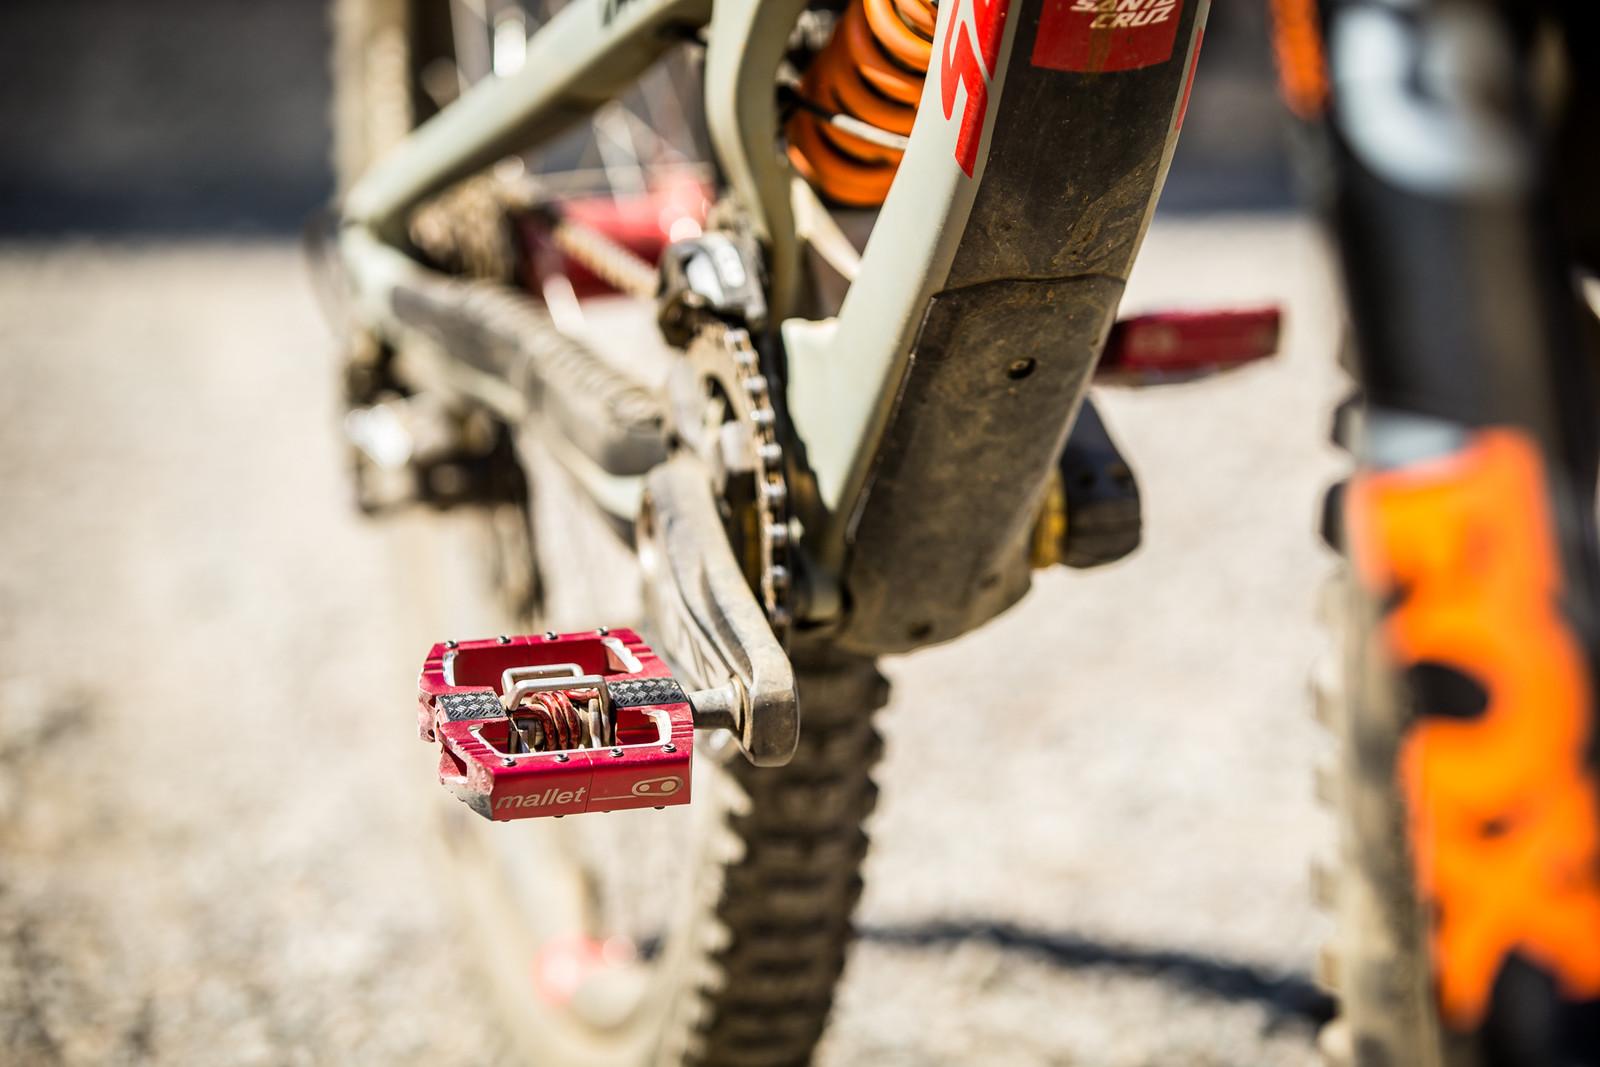 Crank Brothers Mallet Pedals - WINNING BIKE - Loris Vergier's Santa Cruz V10cc 29 - Mountain Biking Pictures - Vital MTB